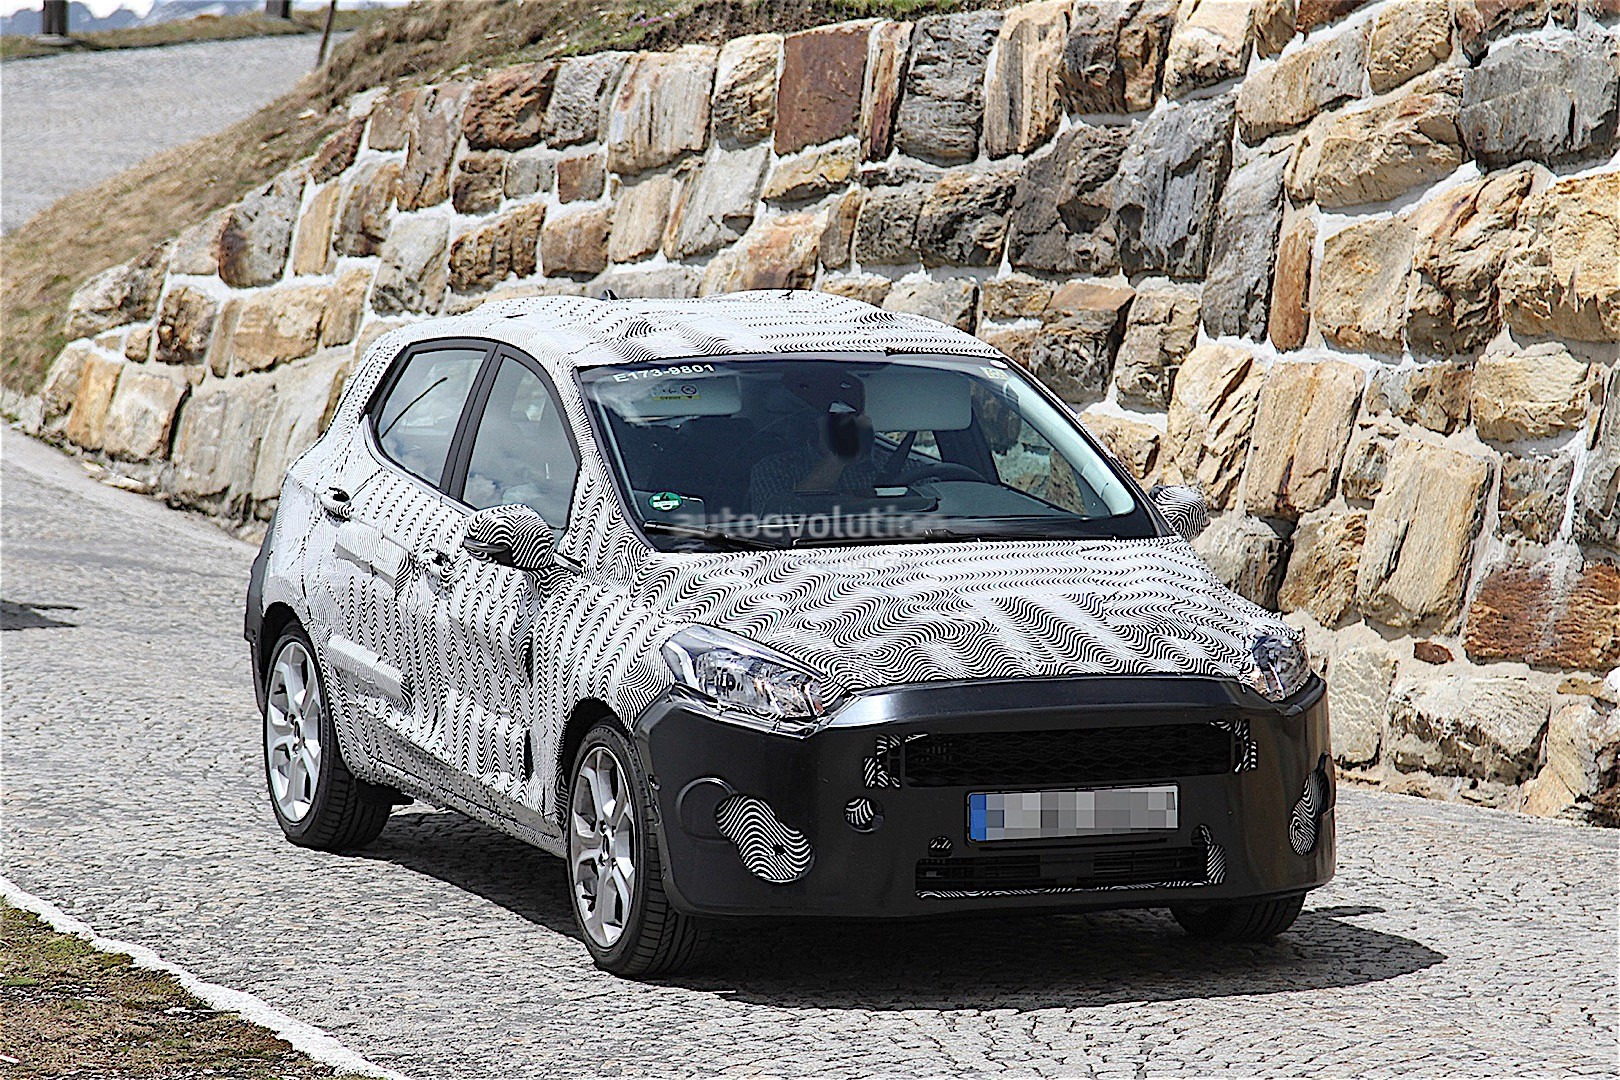 first-spyshots-of-next-generation-ford-fiesta-testing-on-public-roads_12